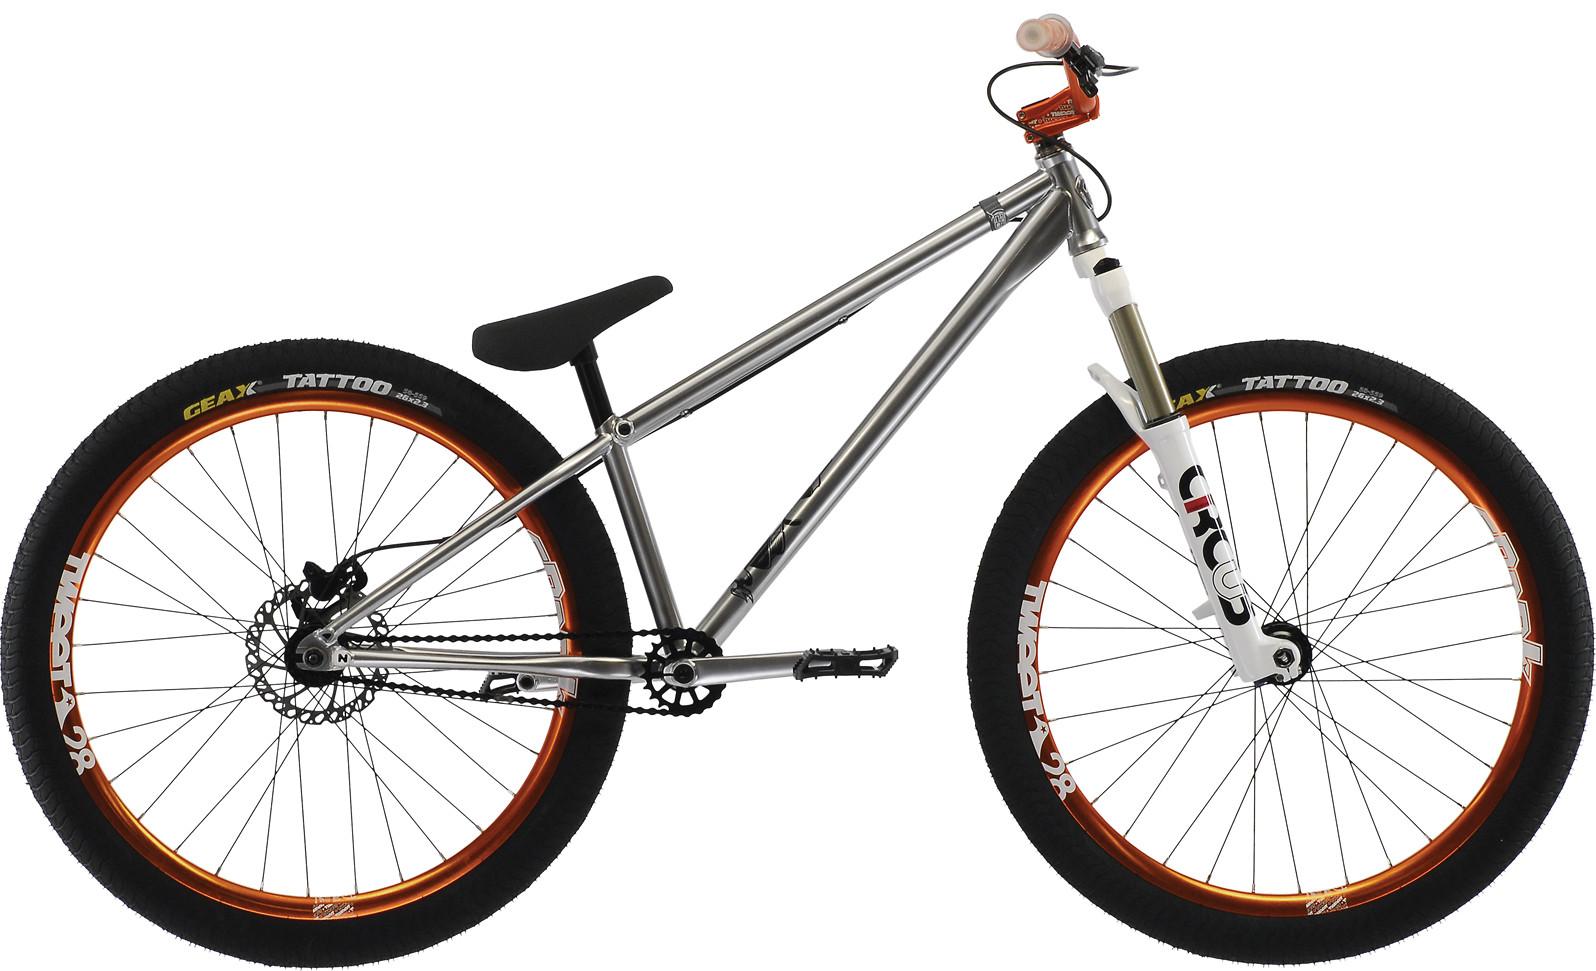 2013 Norco Two50 Bike 064180-13-01-250-slvr